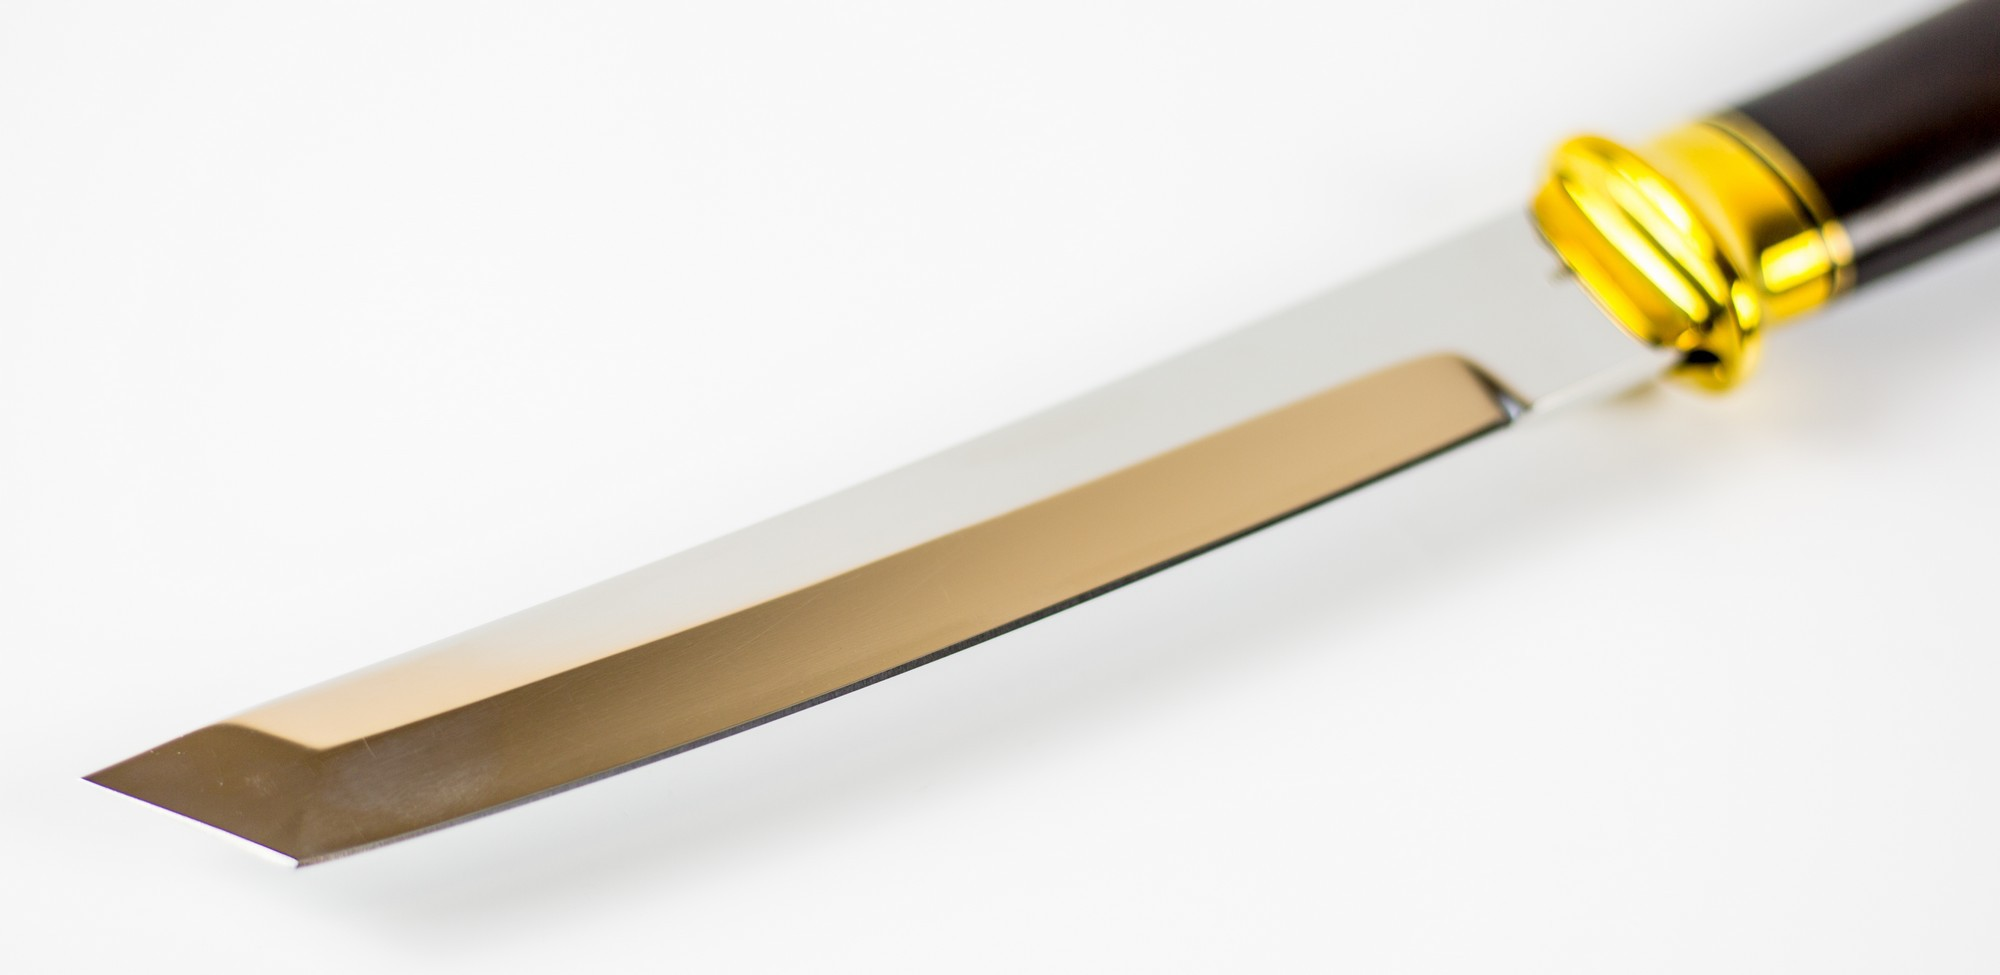 Фото 7 - Нож Танто, сталь 110х18, рукоять граб от Ножи Крутова